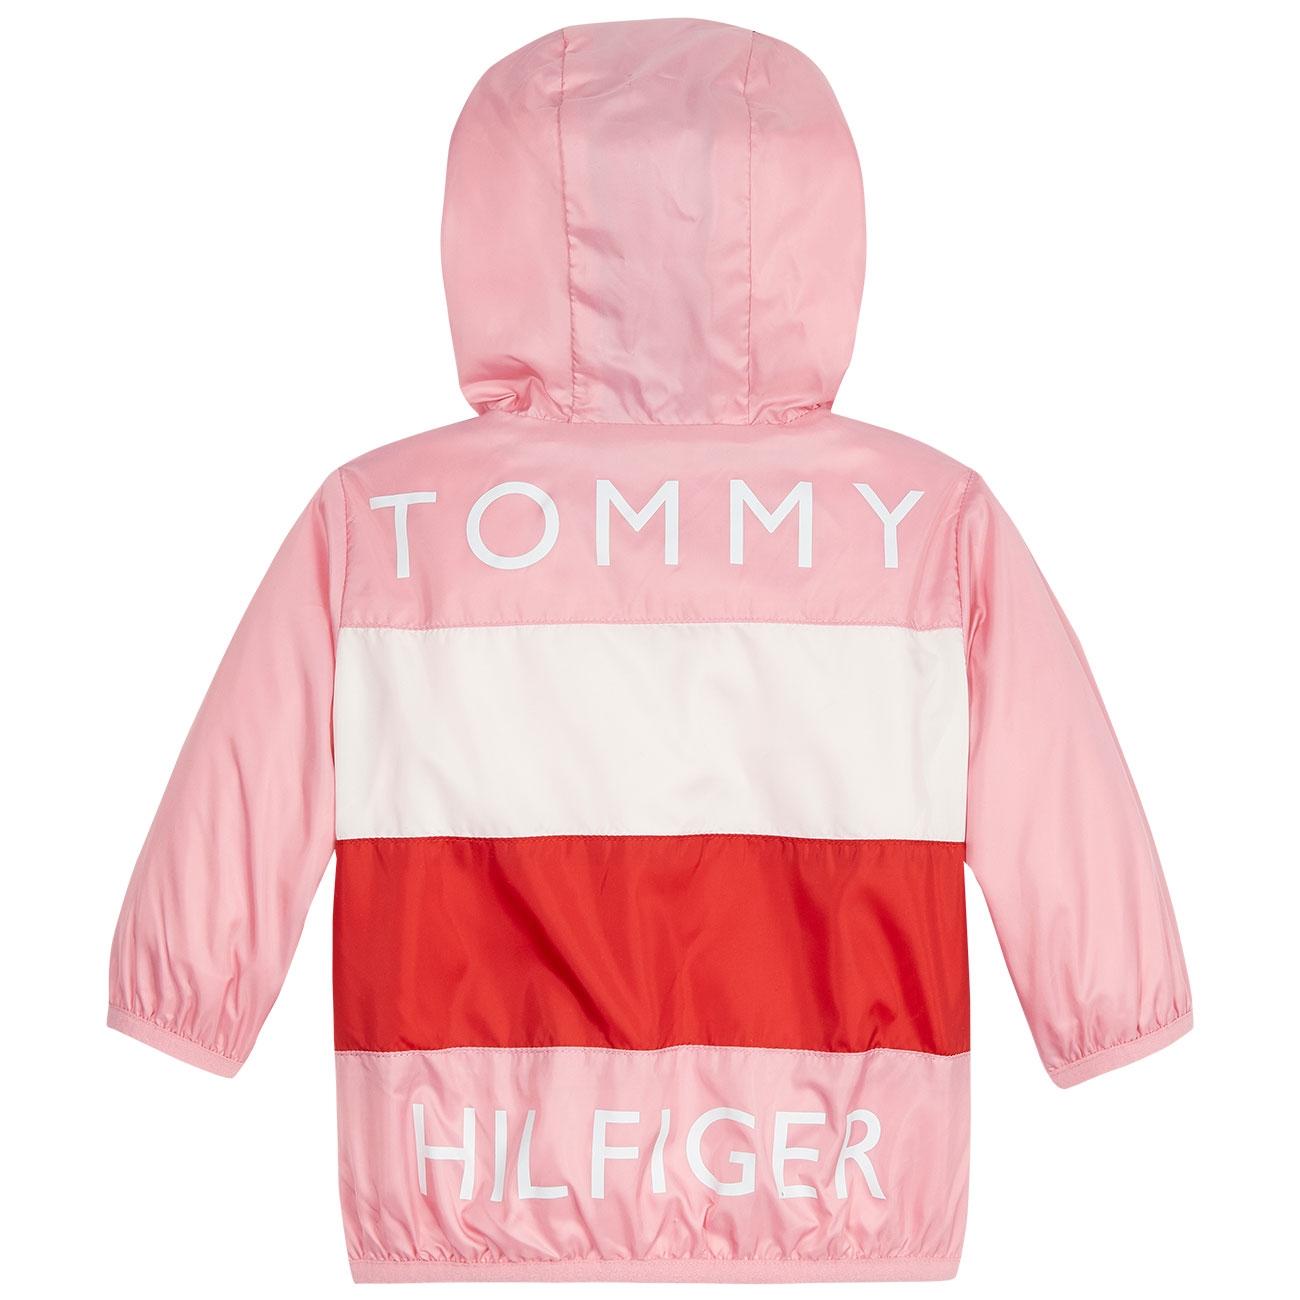 TOMMY HILFIGER JACKET BOYS ZIP UP HOODIE SZ 5 6 RED MATT LOGO FLEECE NEW